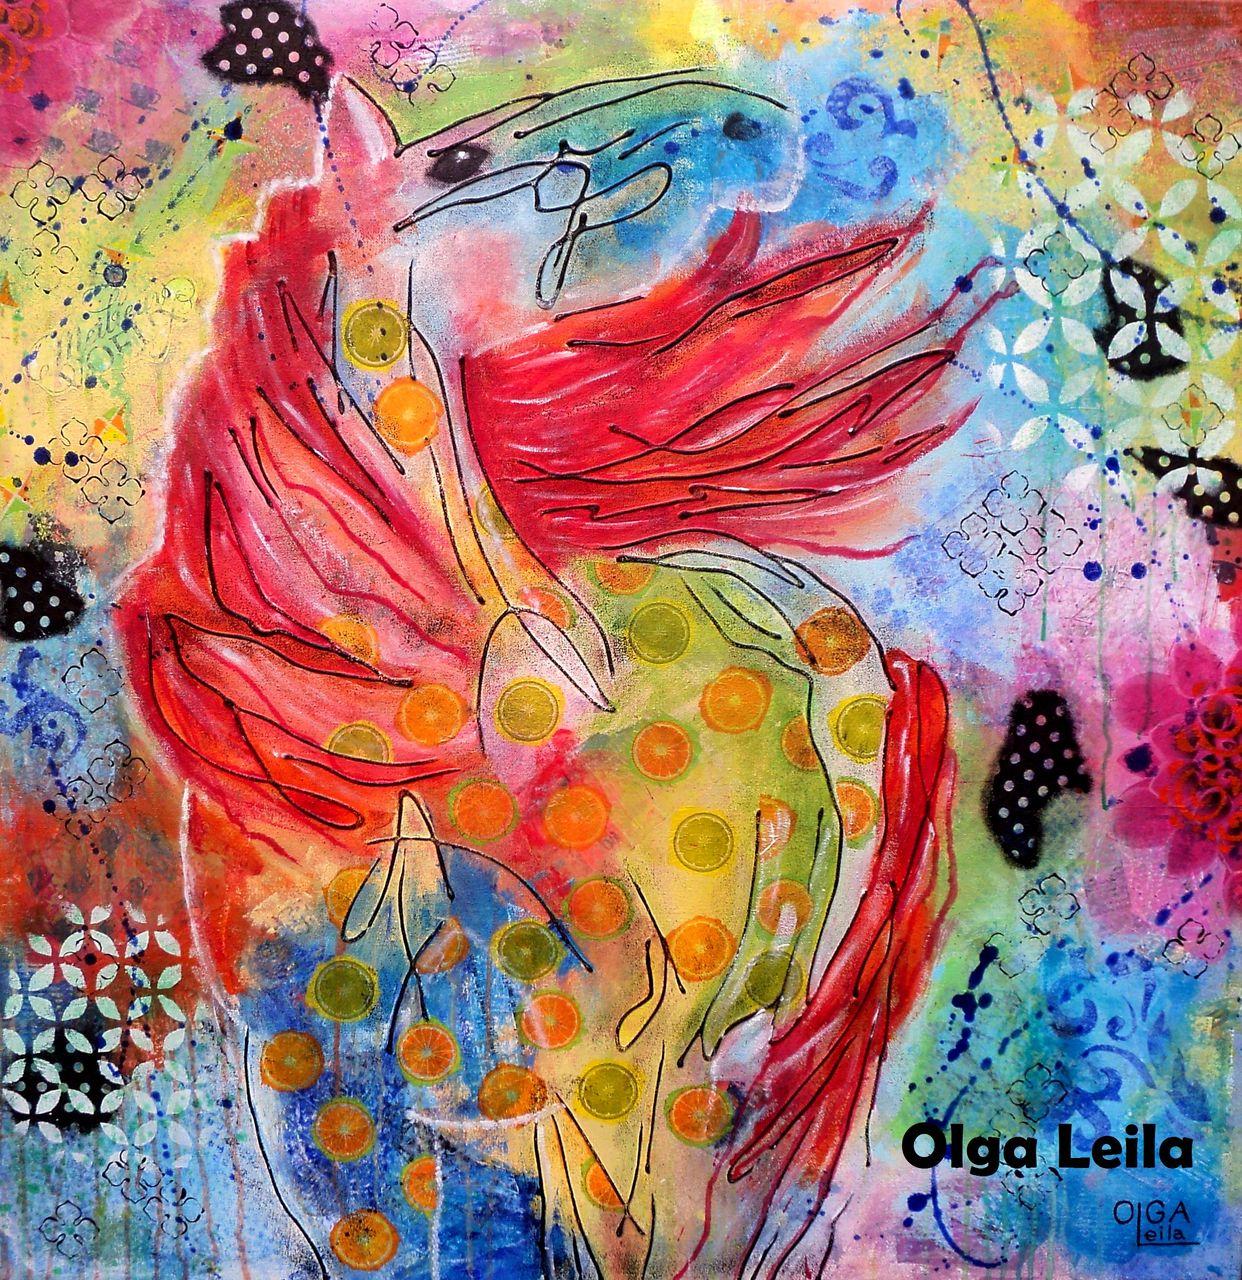 Olga  Leila Le cheval aux oranges